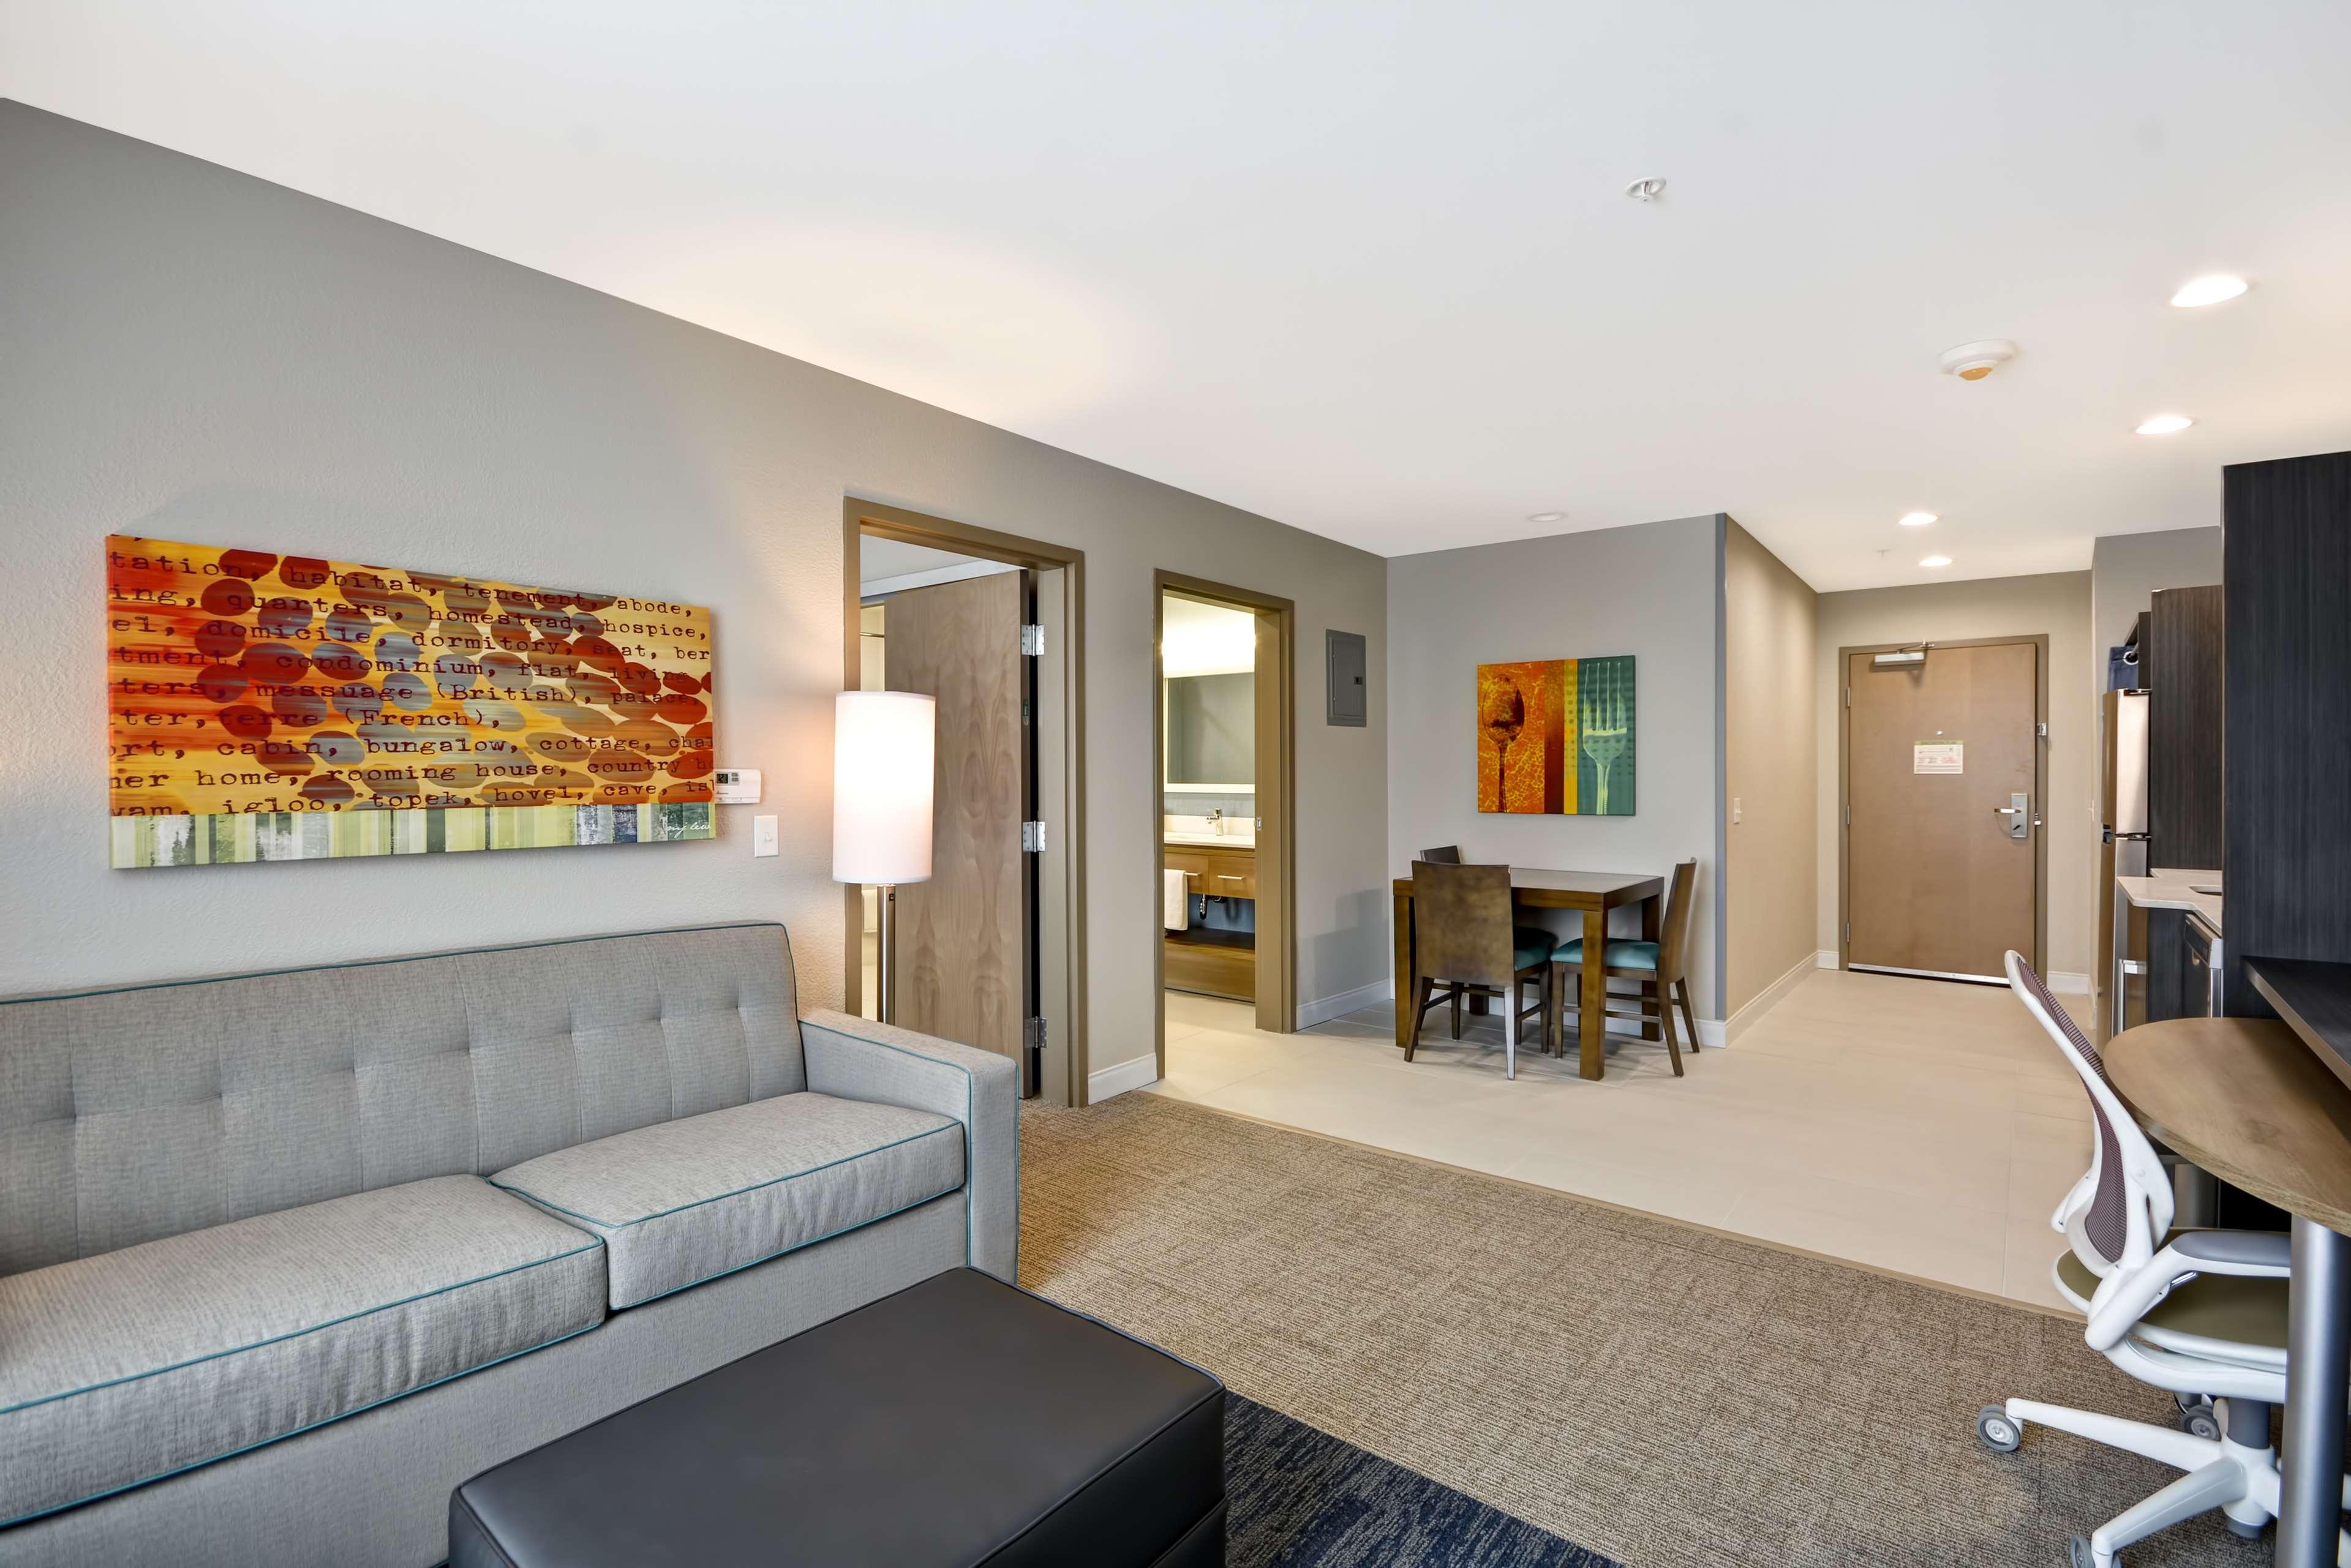 Home2 Suites by Hilton Jackson image 17